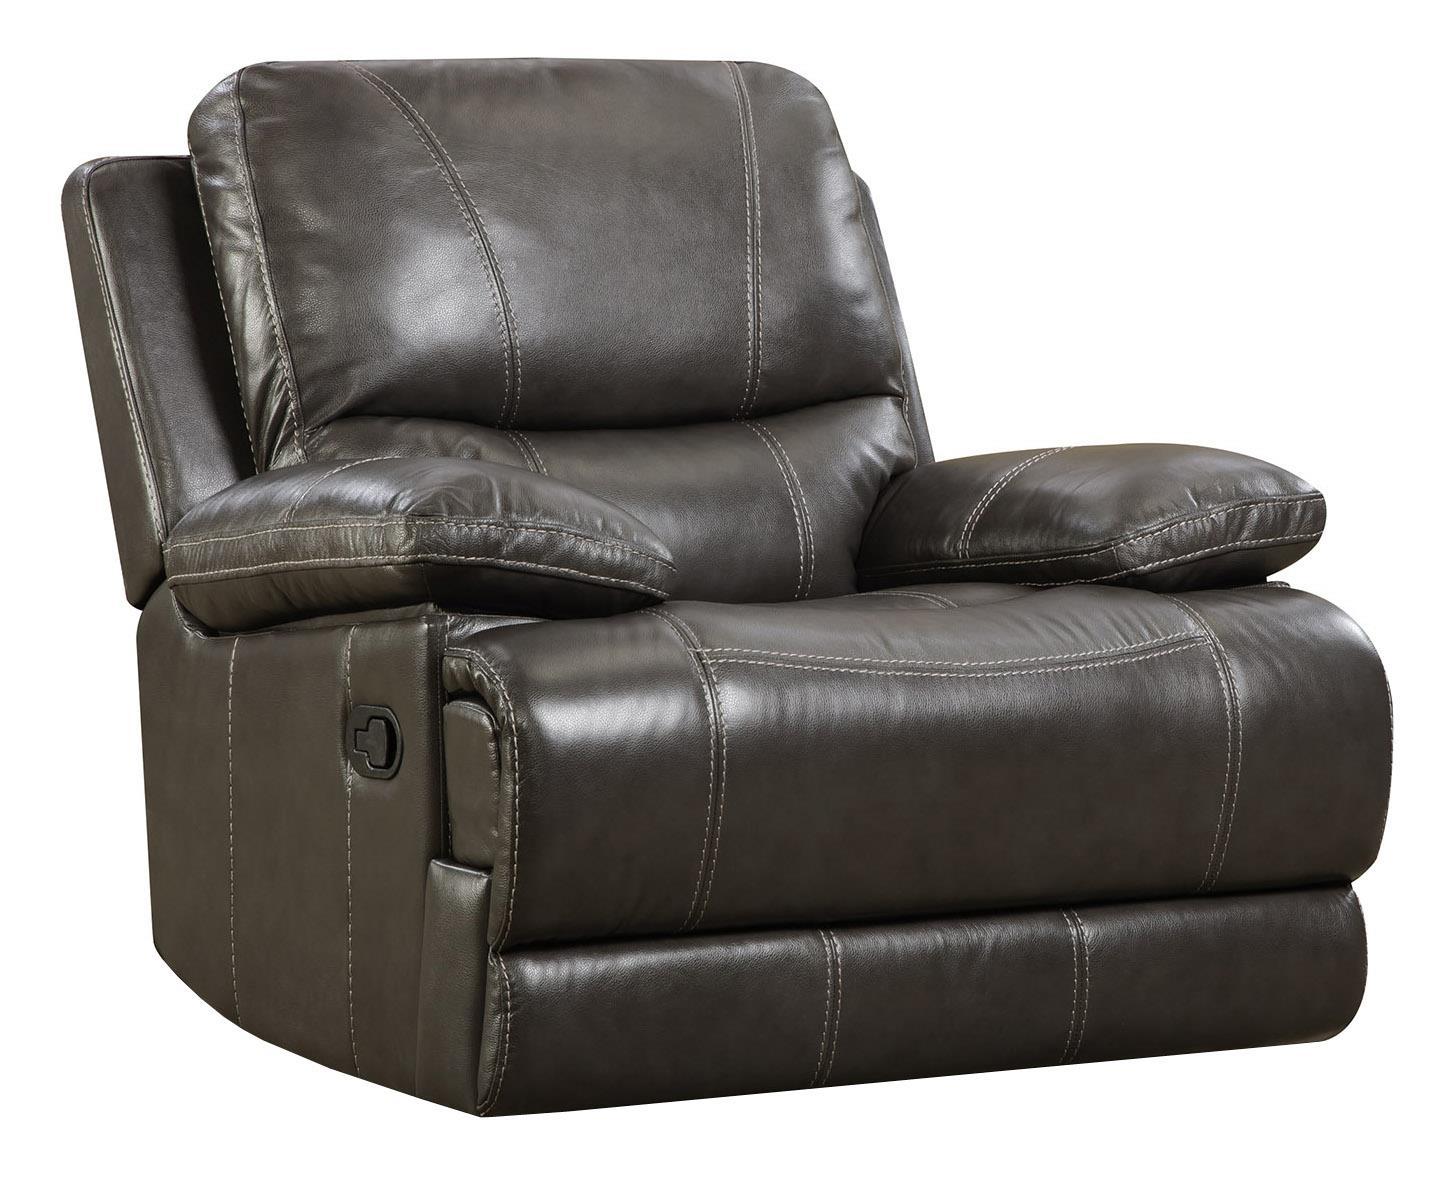 corinthian brooklyn charcoal brooklyn charcoal leather rocker recliner great american home store three way recliner